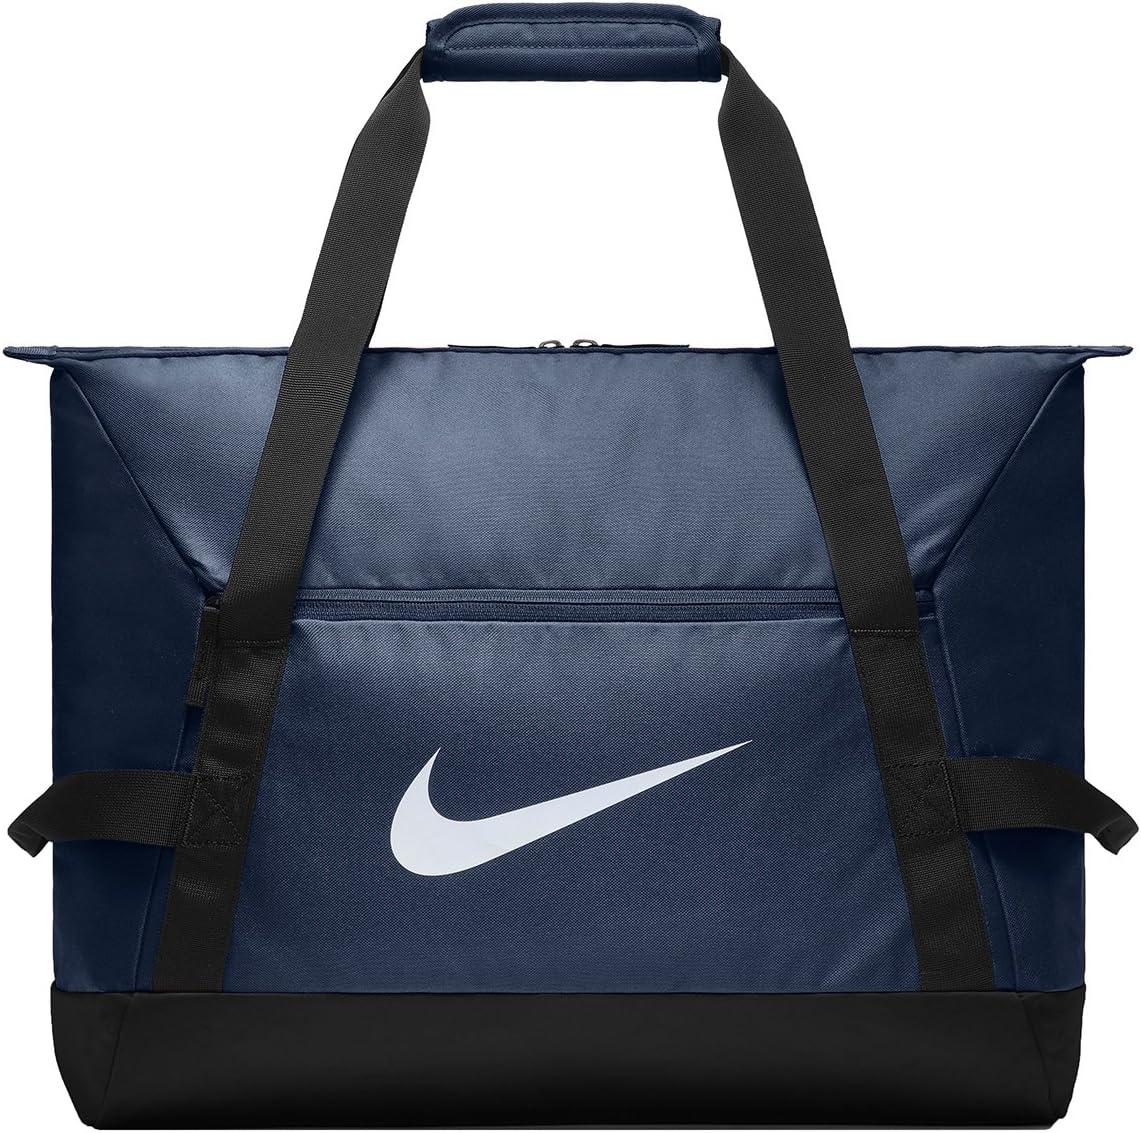 Sac de sport Nike